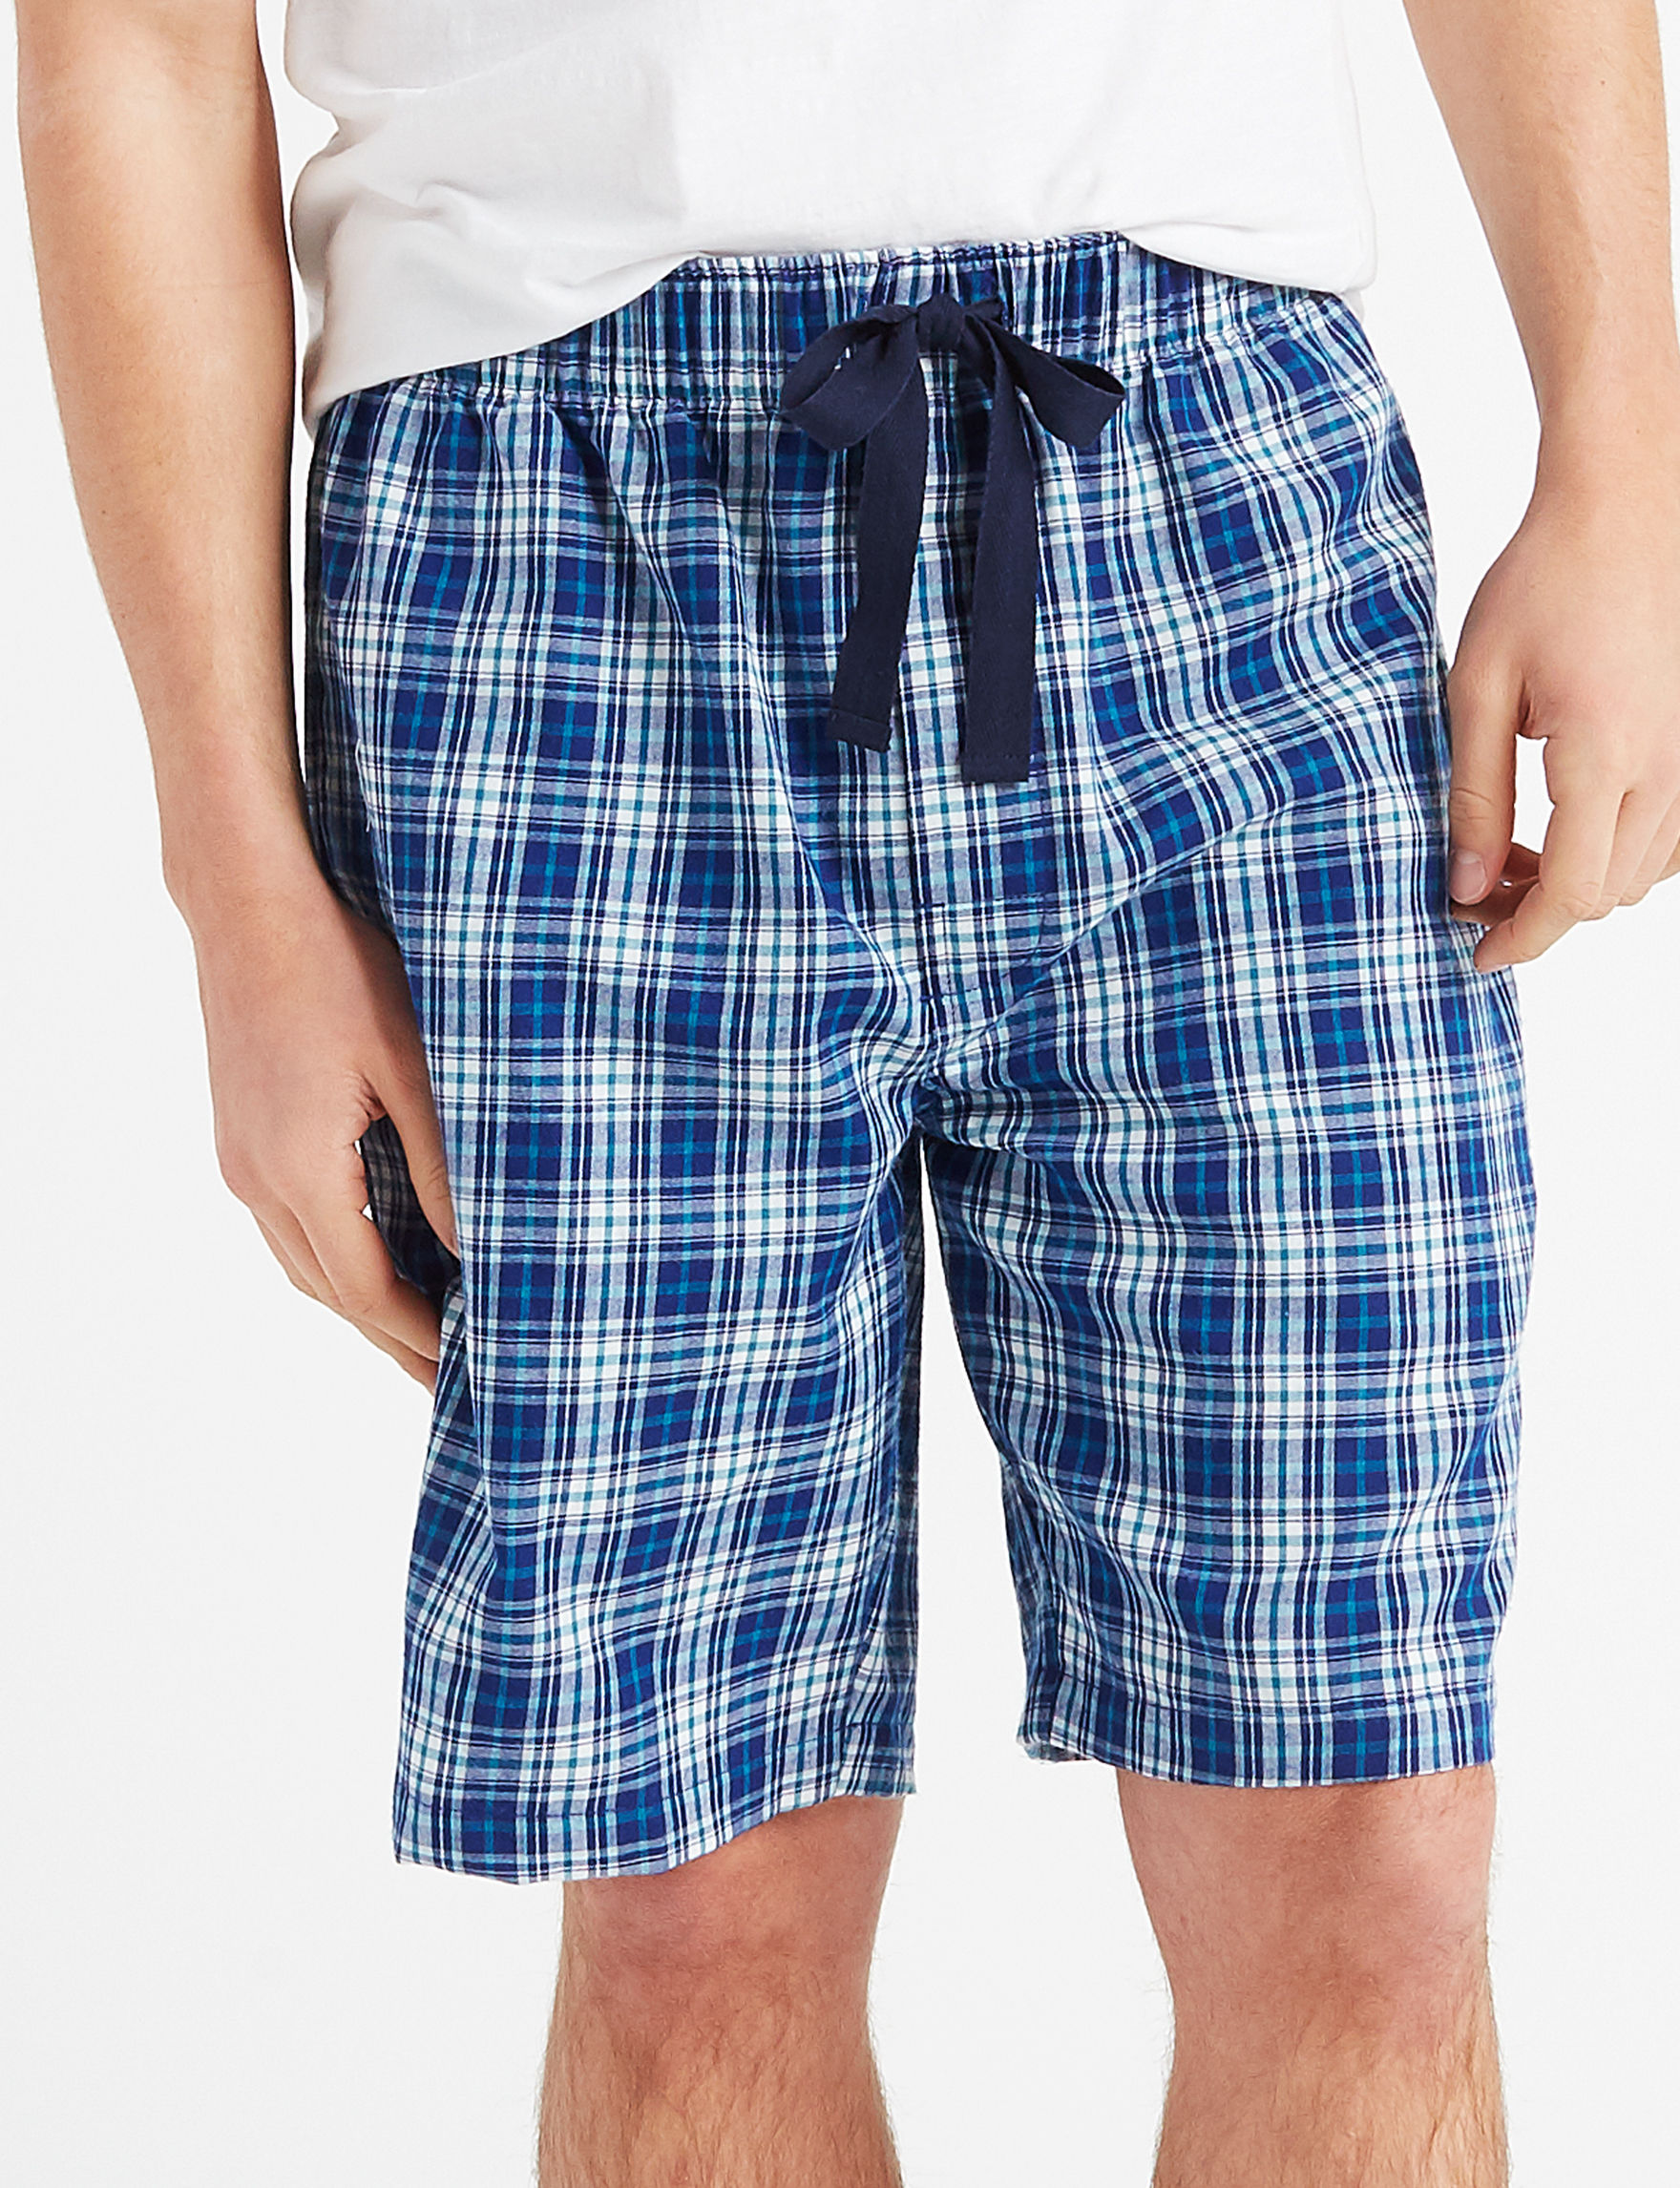 Izod Blue / White Pajama Bottoms